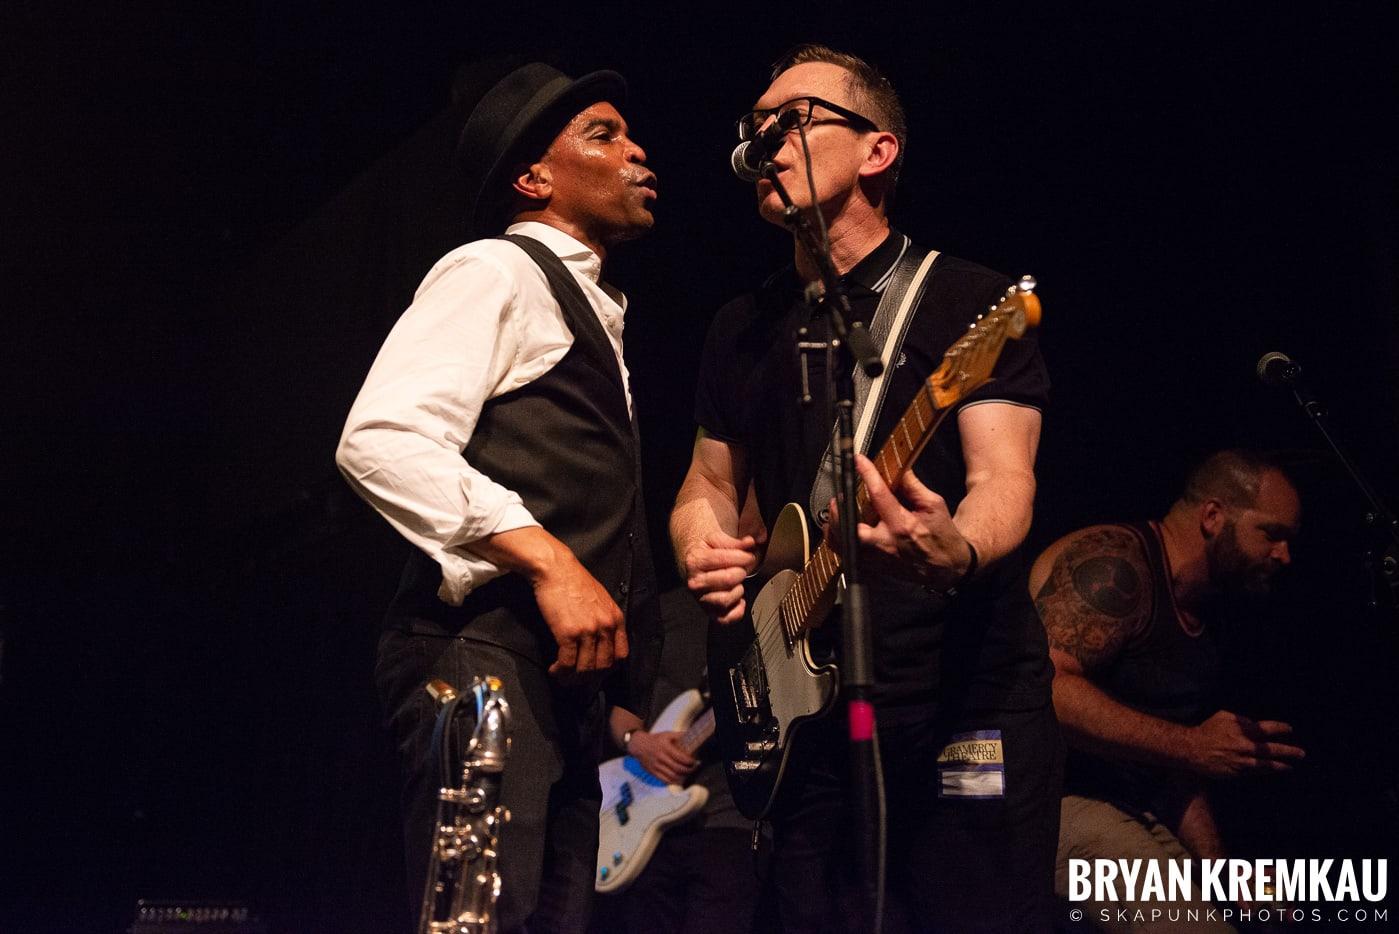 Rude Boy George @ Radicsfest, Gramercy Theatre, NYC - 7.19.19 (9)